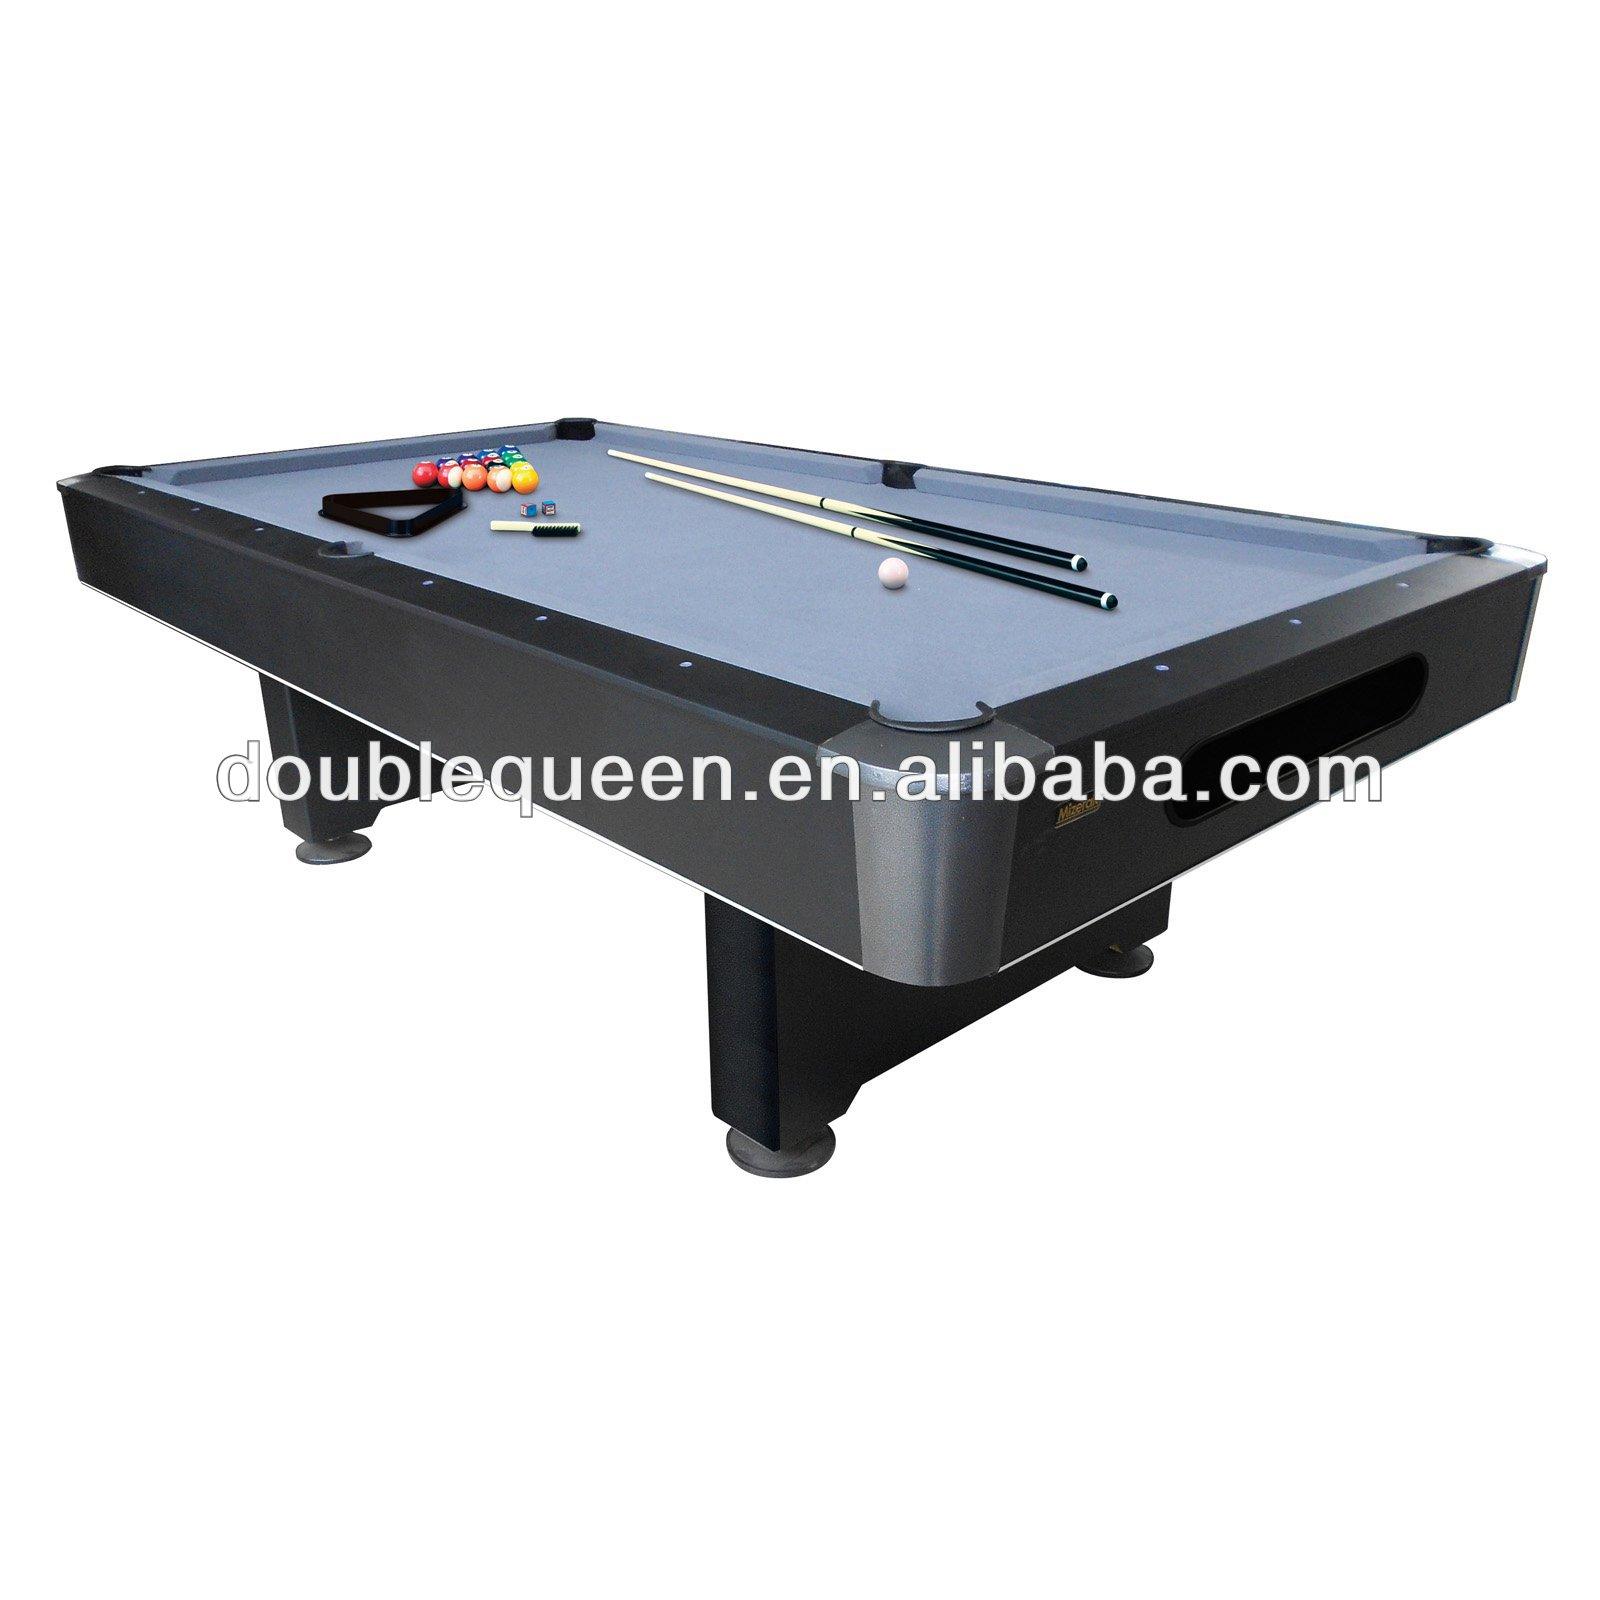 Hot Sale Aluminum Pool Table Buy Aluminum Pool TableBrinktun Pool - Aluminum pool table